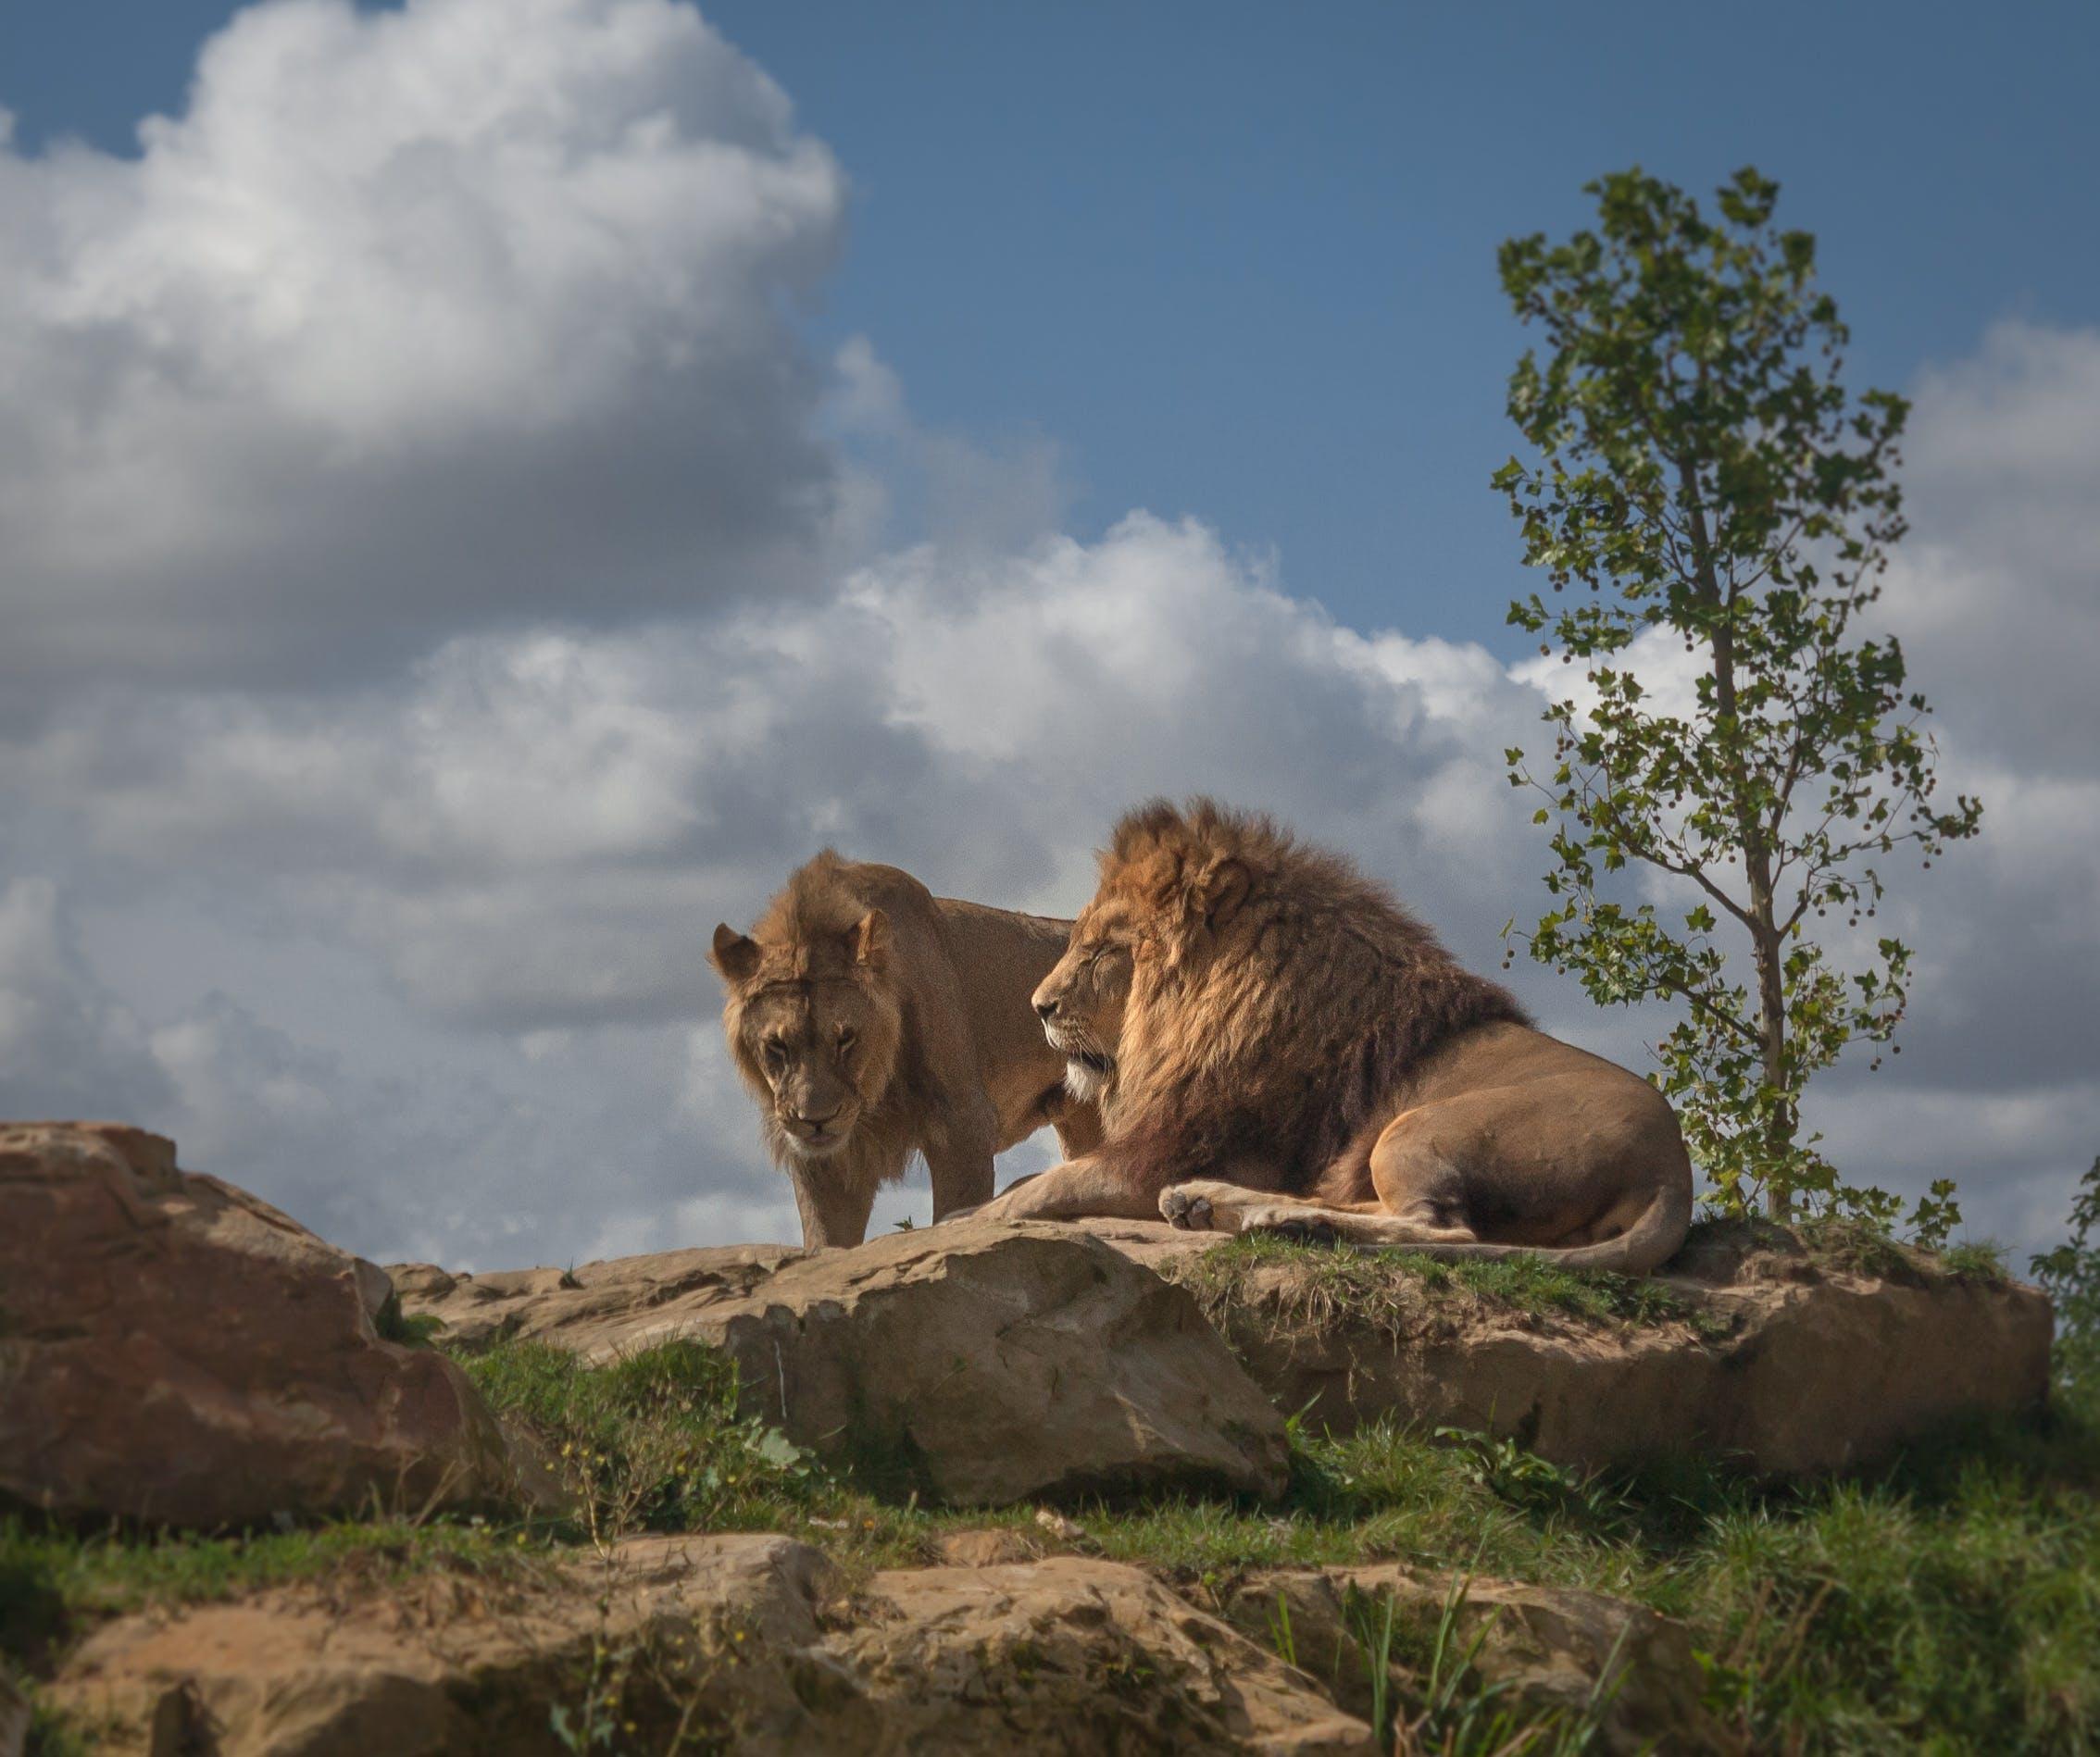 Kostenloses Stock Foto zu tier, zoo, könig, löwe